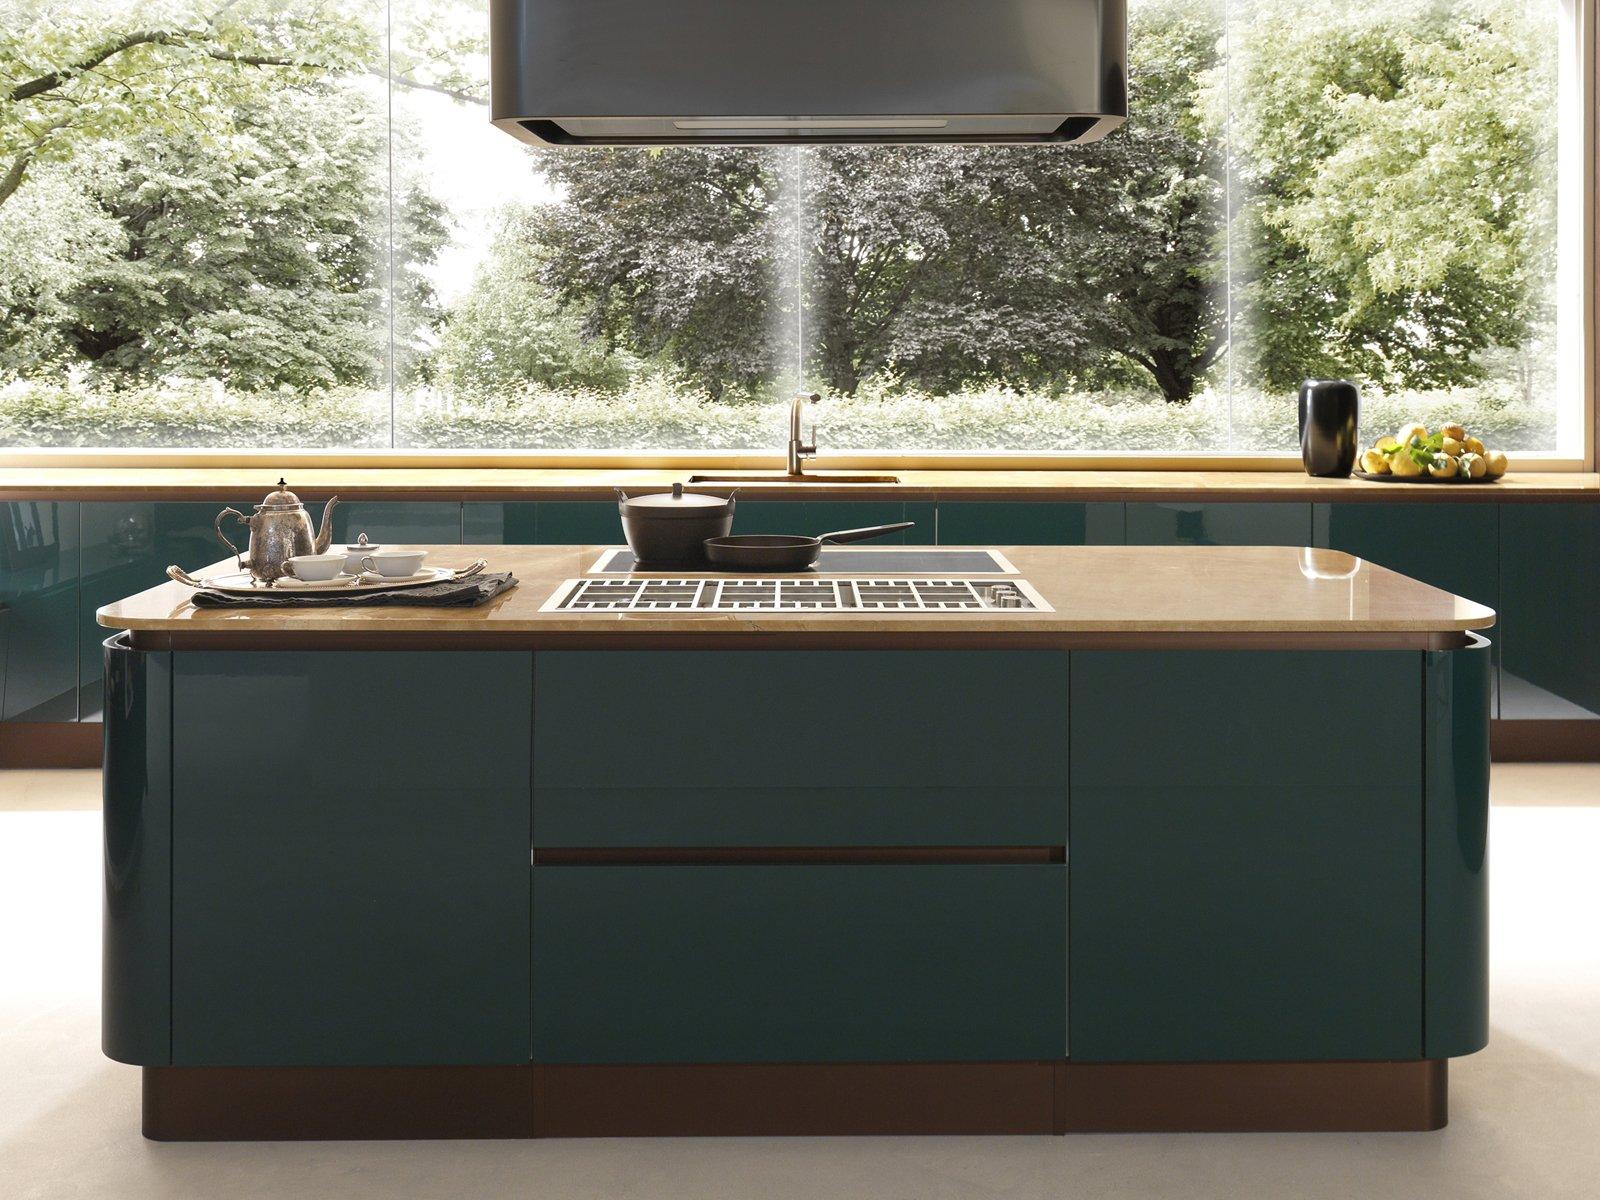 ... cucina è di 22 mm, a garanzia di robustezza e solidità. Un modulo da